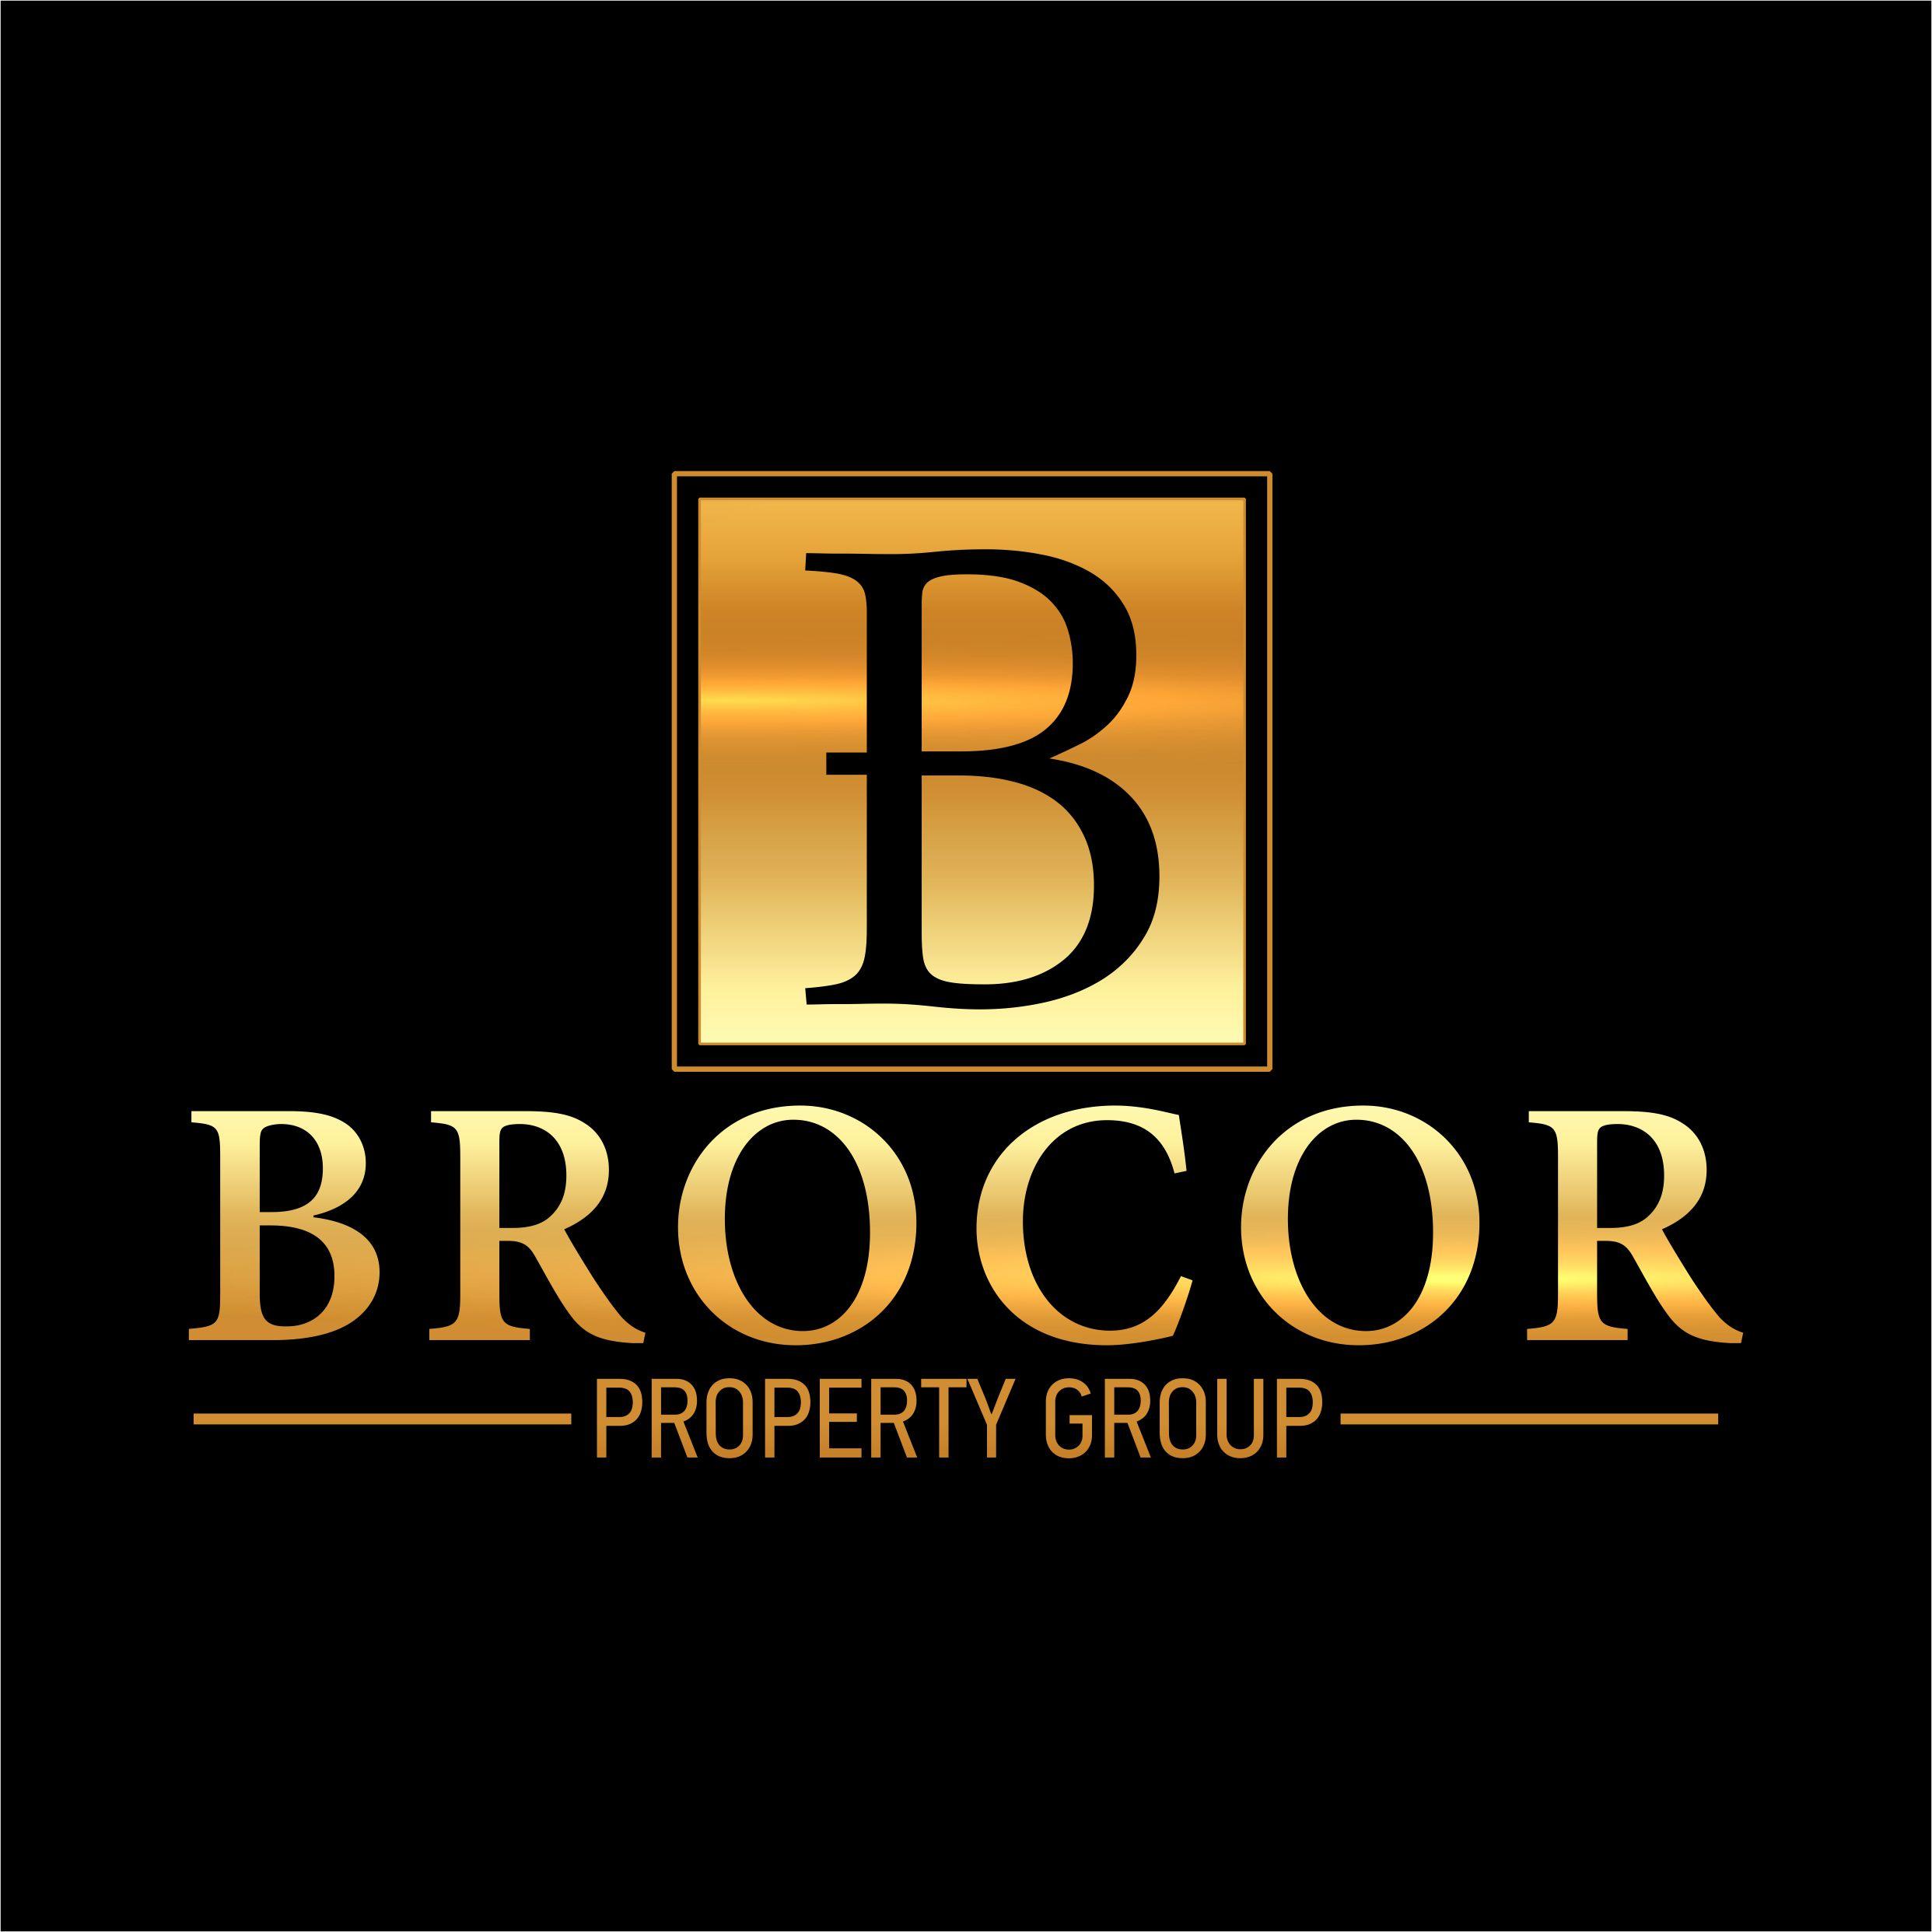 Brocor Property Group | GotProperty